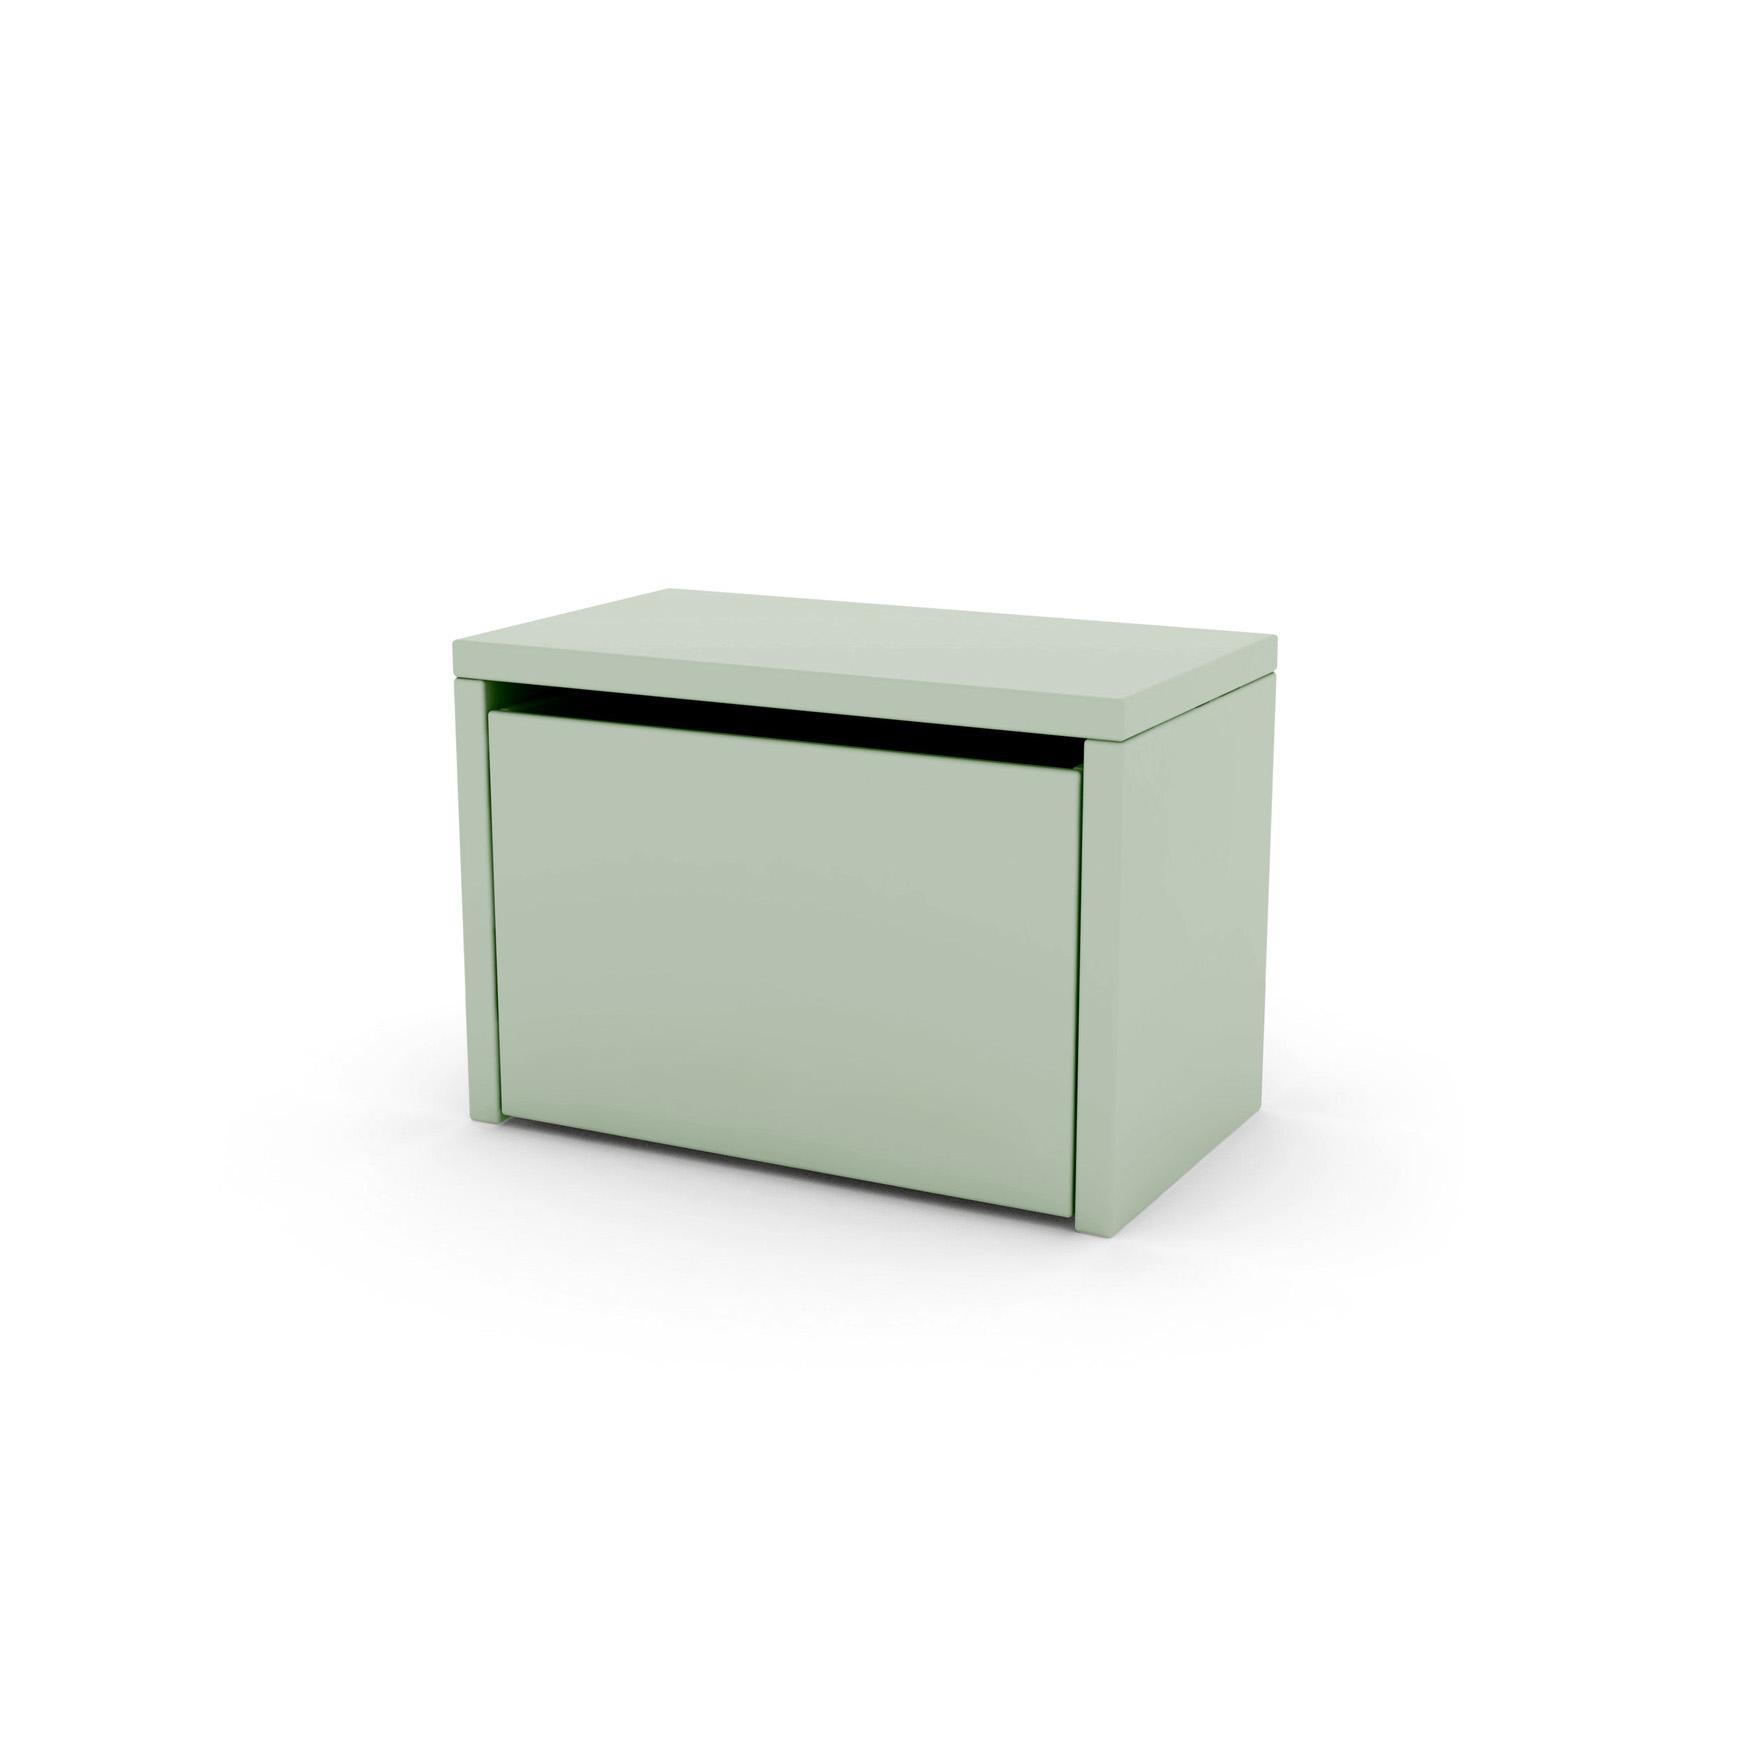 Flexa Play - Storage Bench - Mint Green at FADS.co.uk